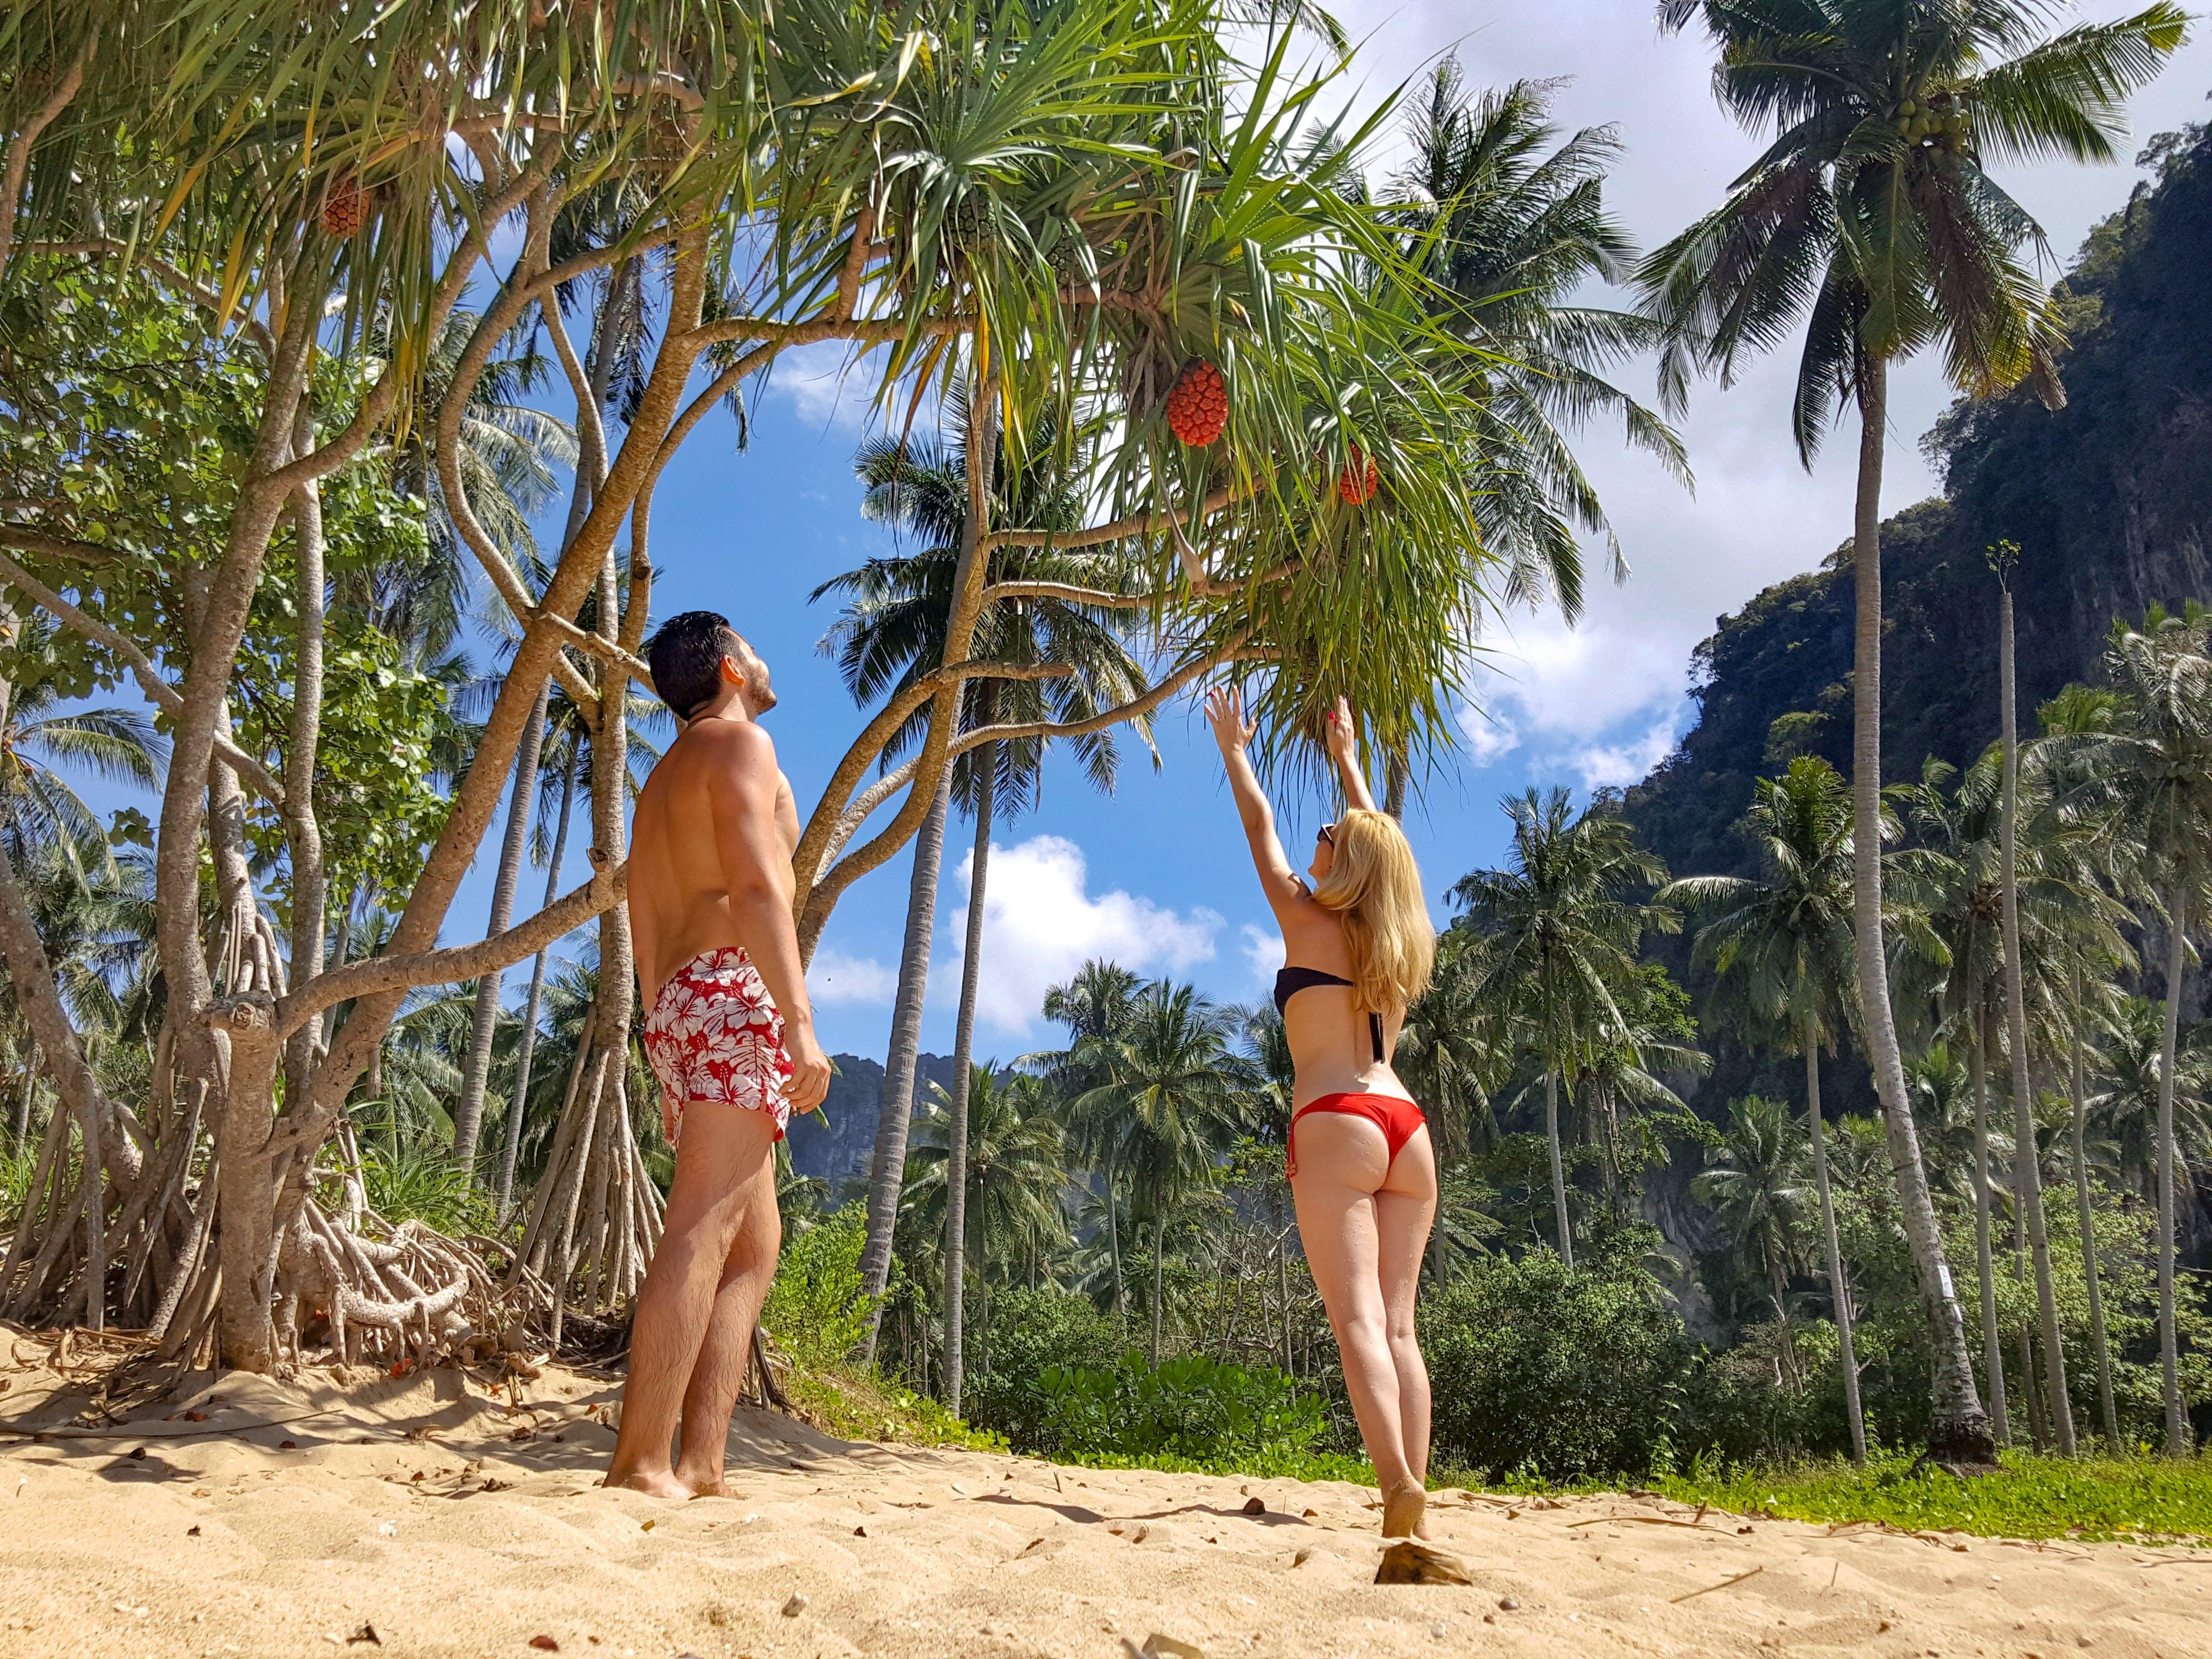 Kostenloses Stock Foto zu badeanzug, bäume, bikini, draußen